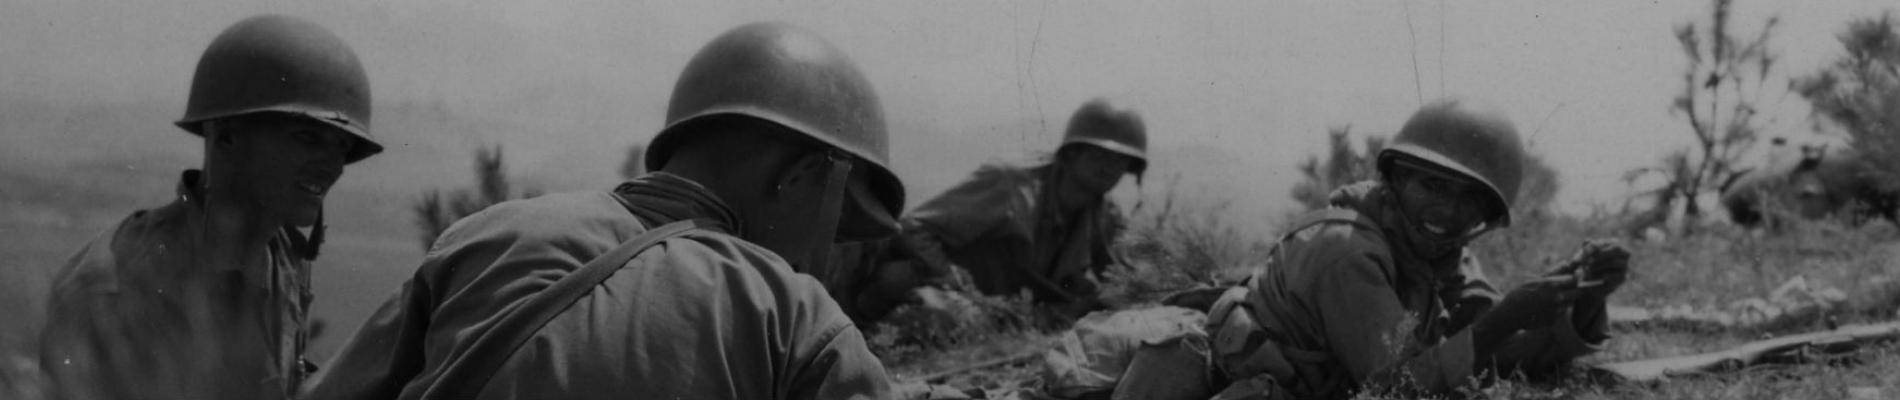 Cold War Crisis- The Korean War